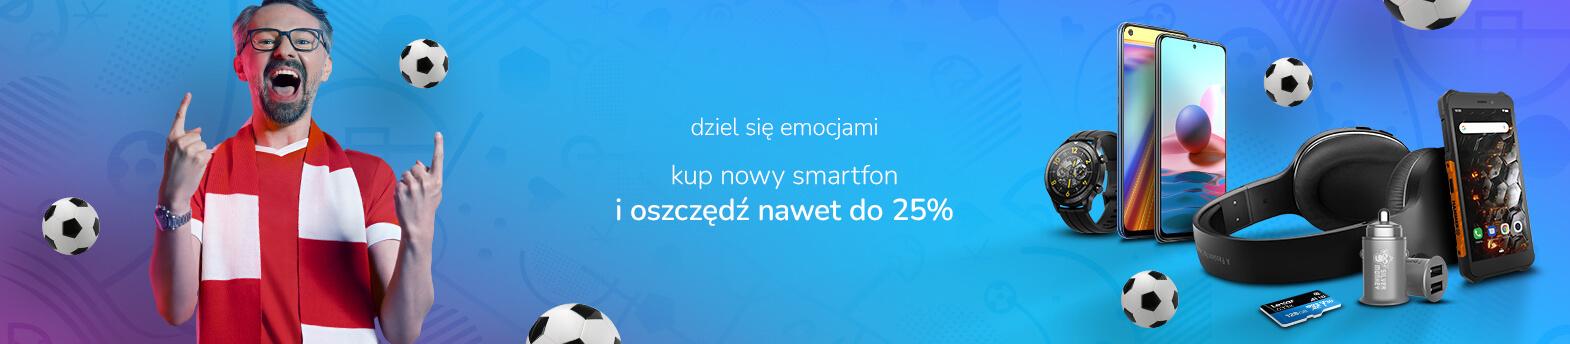 smartfony z rabatem do 25%